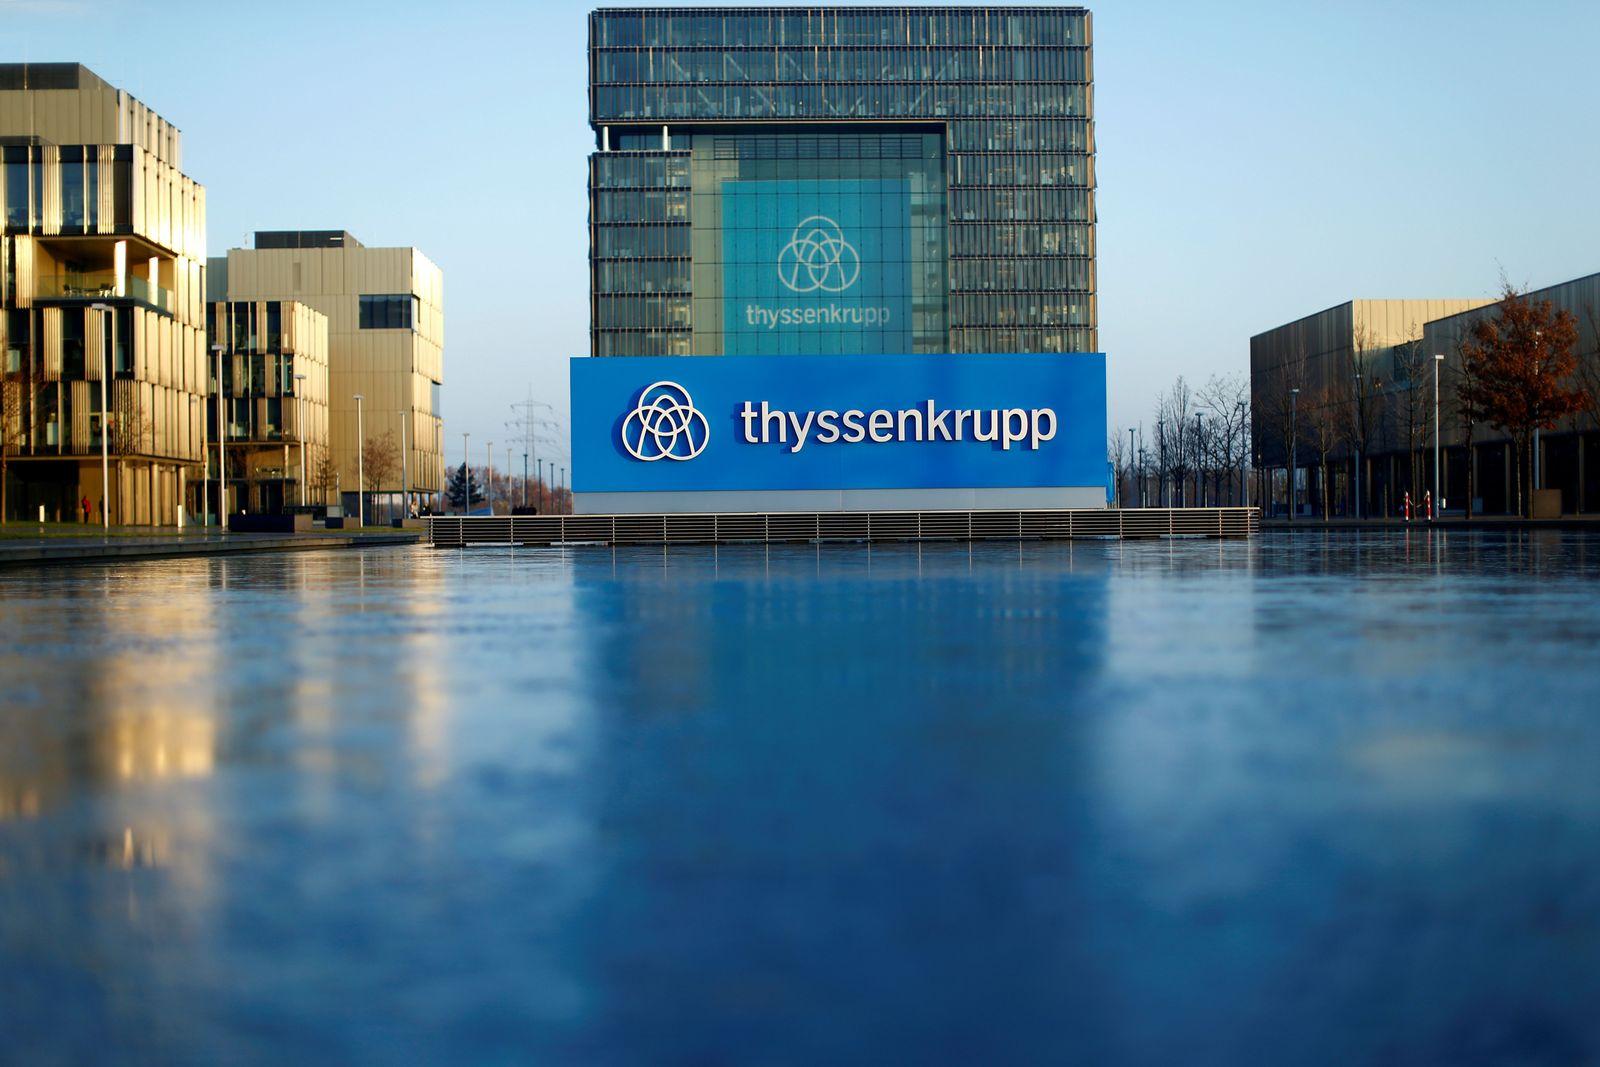 THYSSENKRUPP-SPLIT/ELEVATORS